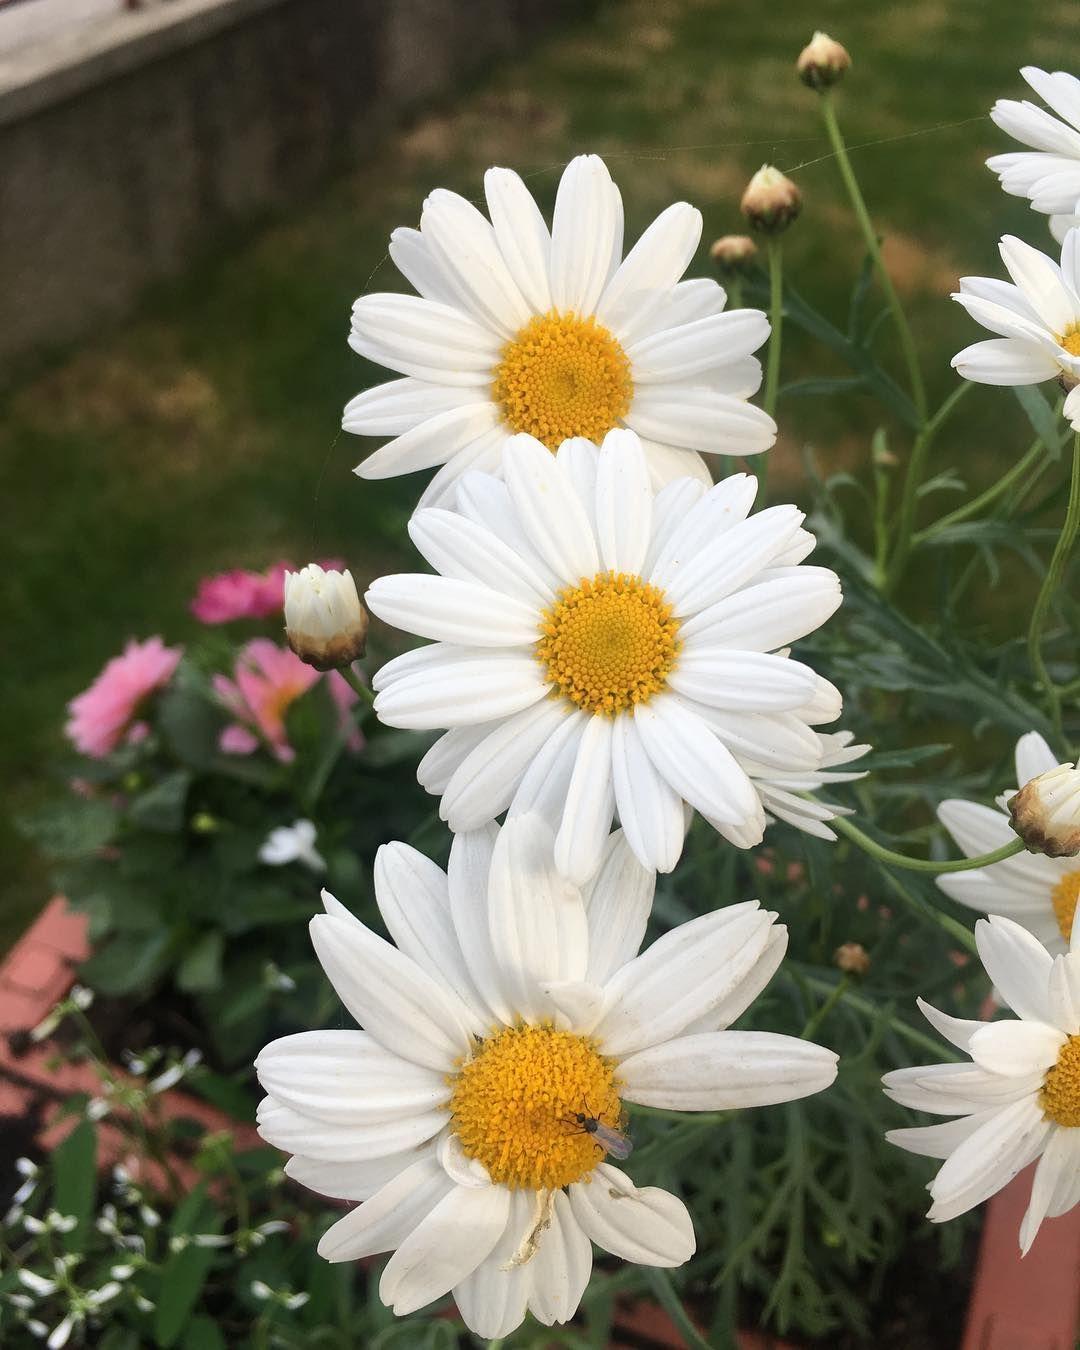 #love#beautiful#garden#flower#flowerpower#prievidza#holiday#positiveenergy#slovakia#dnescestujem#happiness#goodvibes#slovensko#trip#flowers#happy#spring#flowerlover#nature#sunnyday#greenery#loveit#inlove#explore#spring#adventure#perfect#instagood#photooftheday#tbt